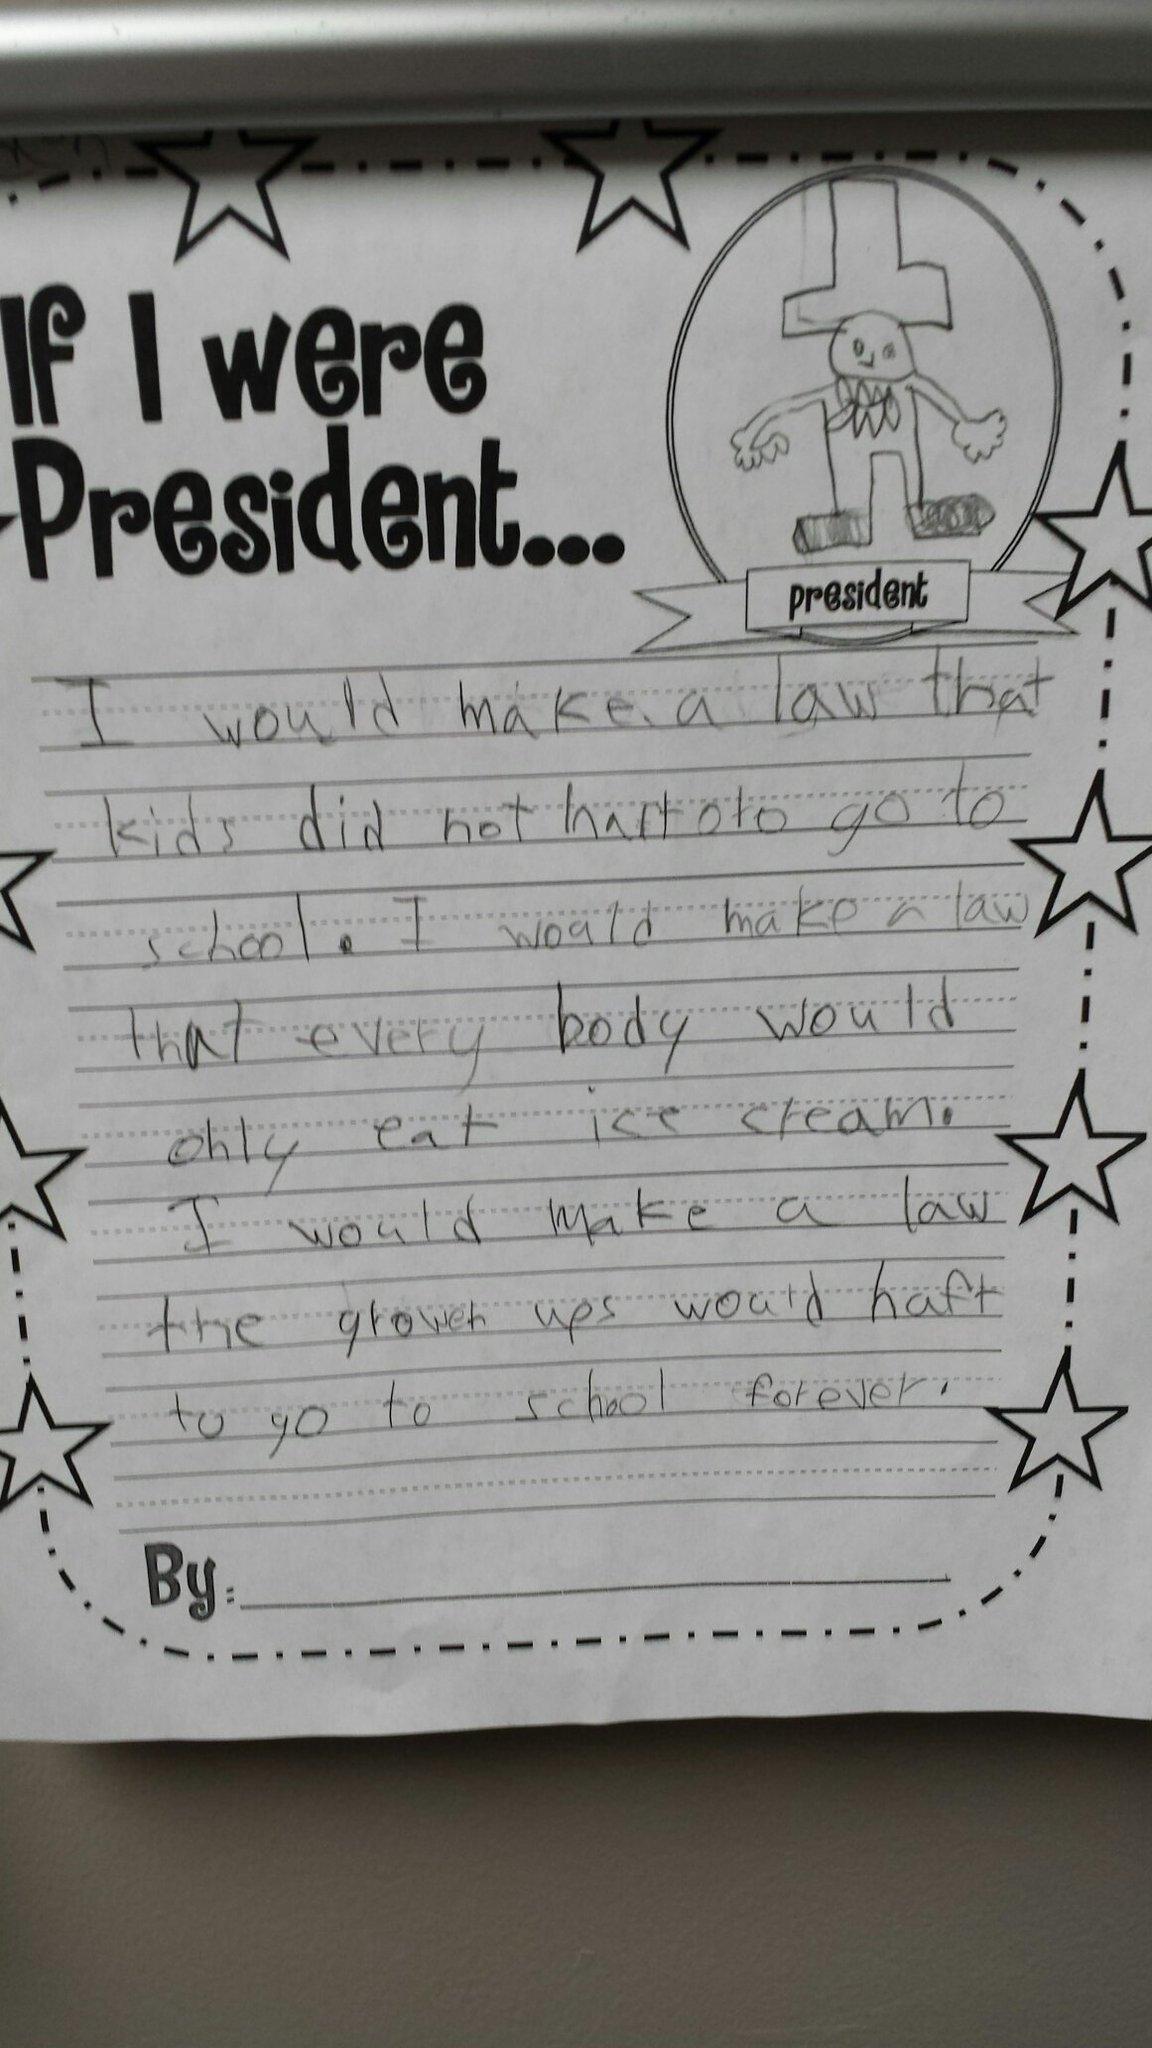 If I were president elementary school edition - meme